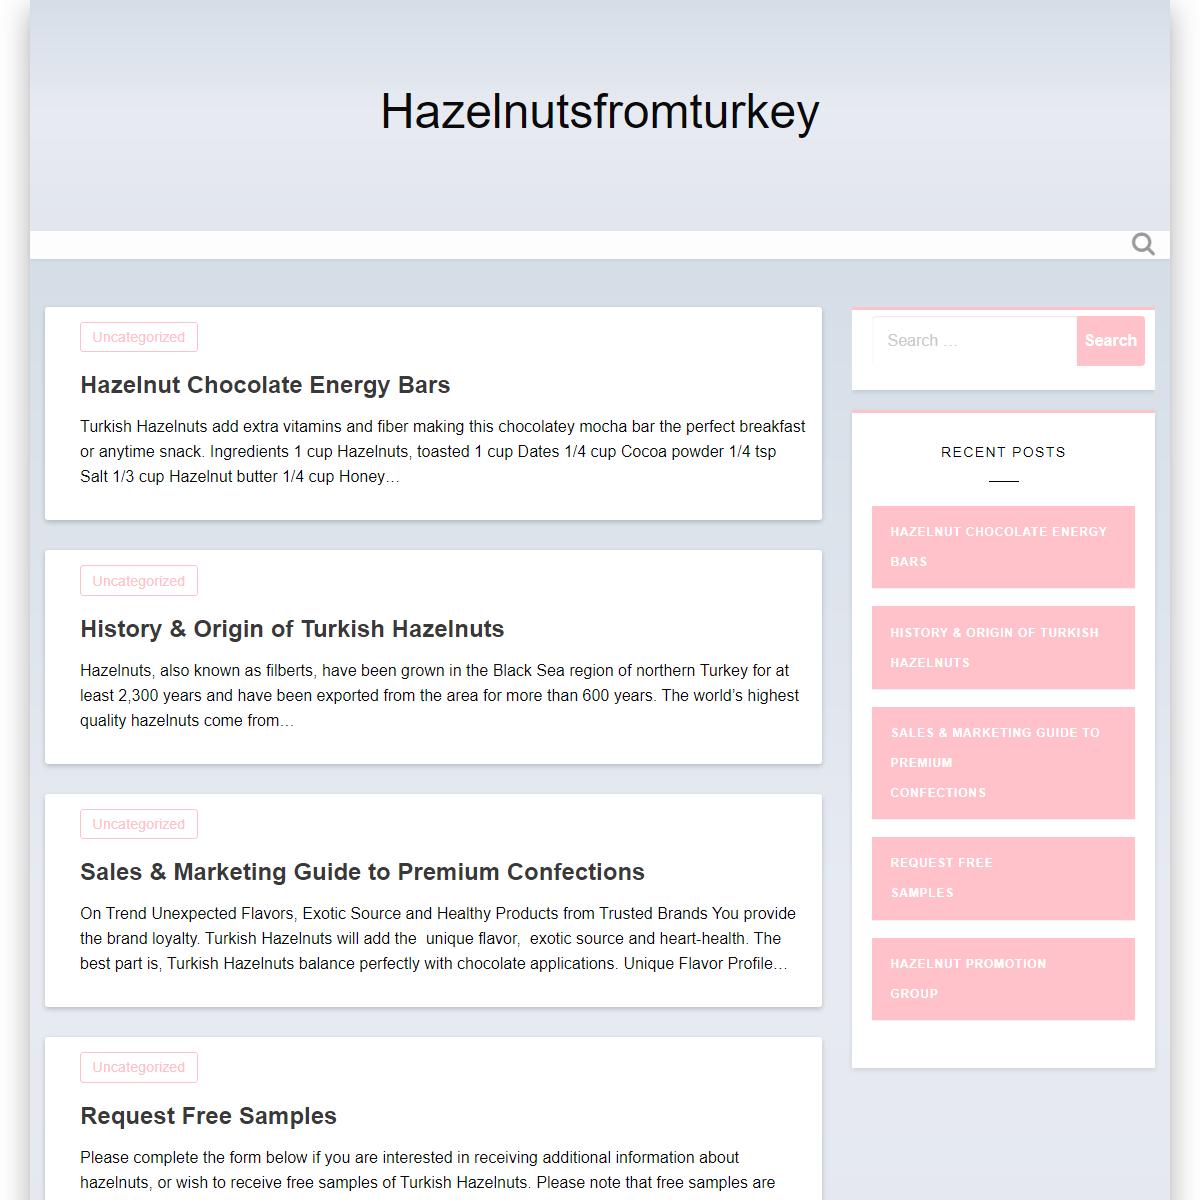 Hazelnutsfromturkey